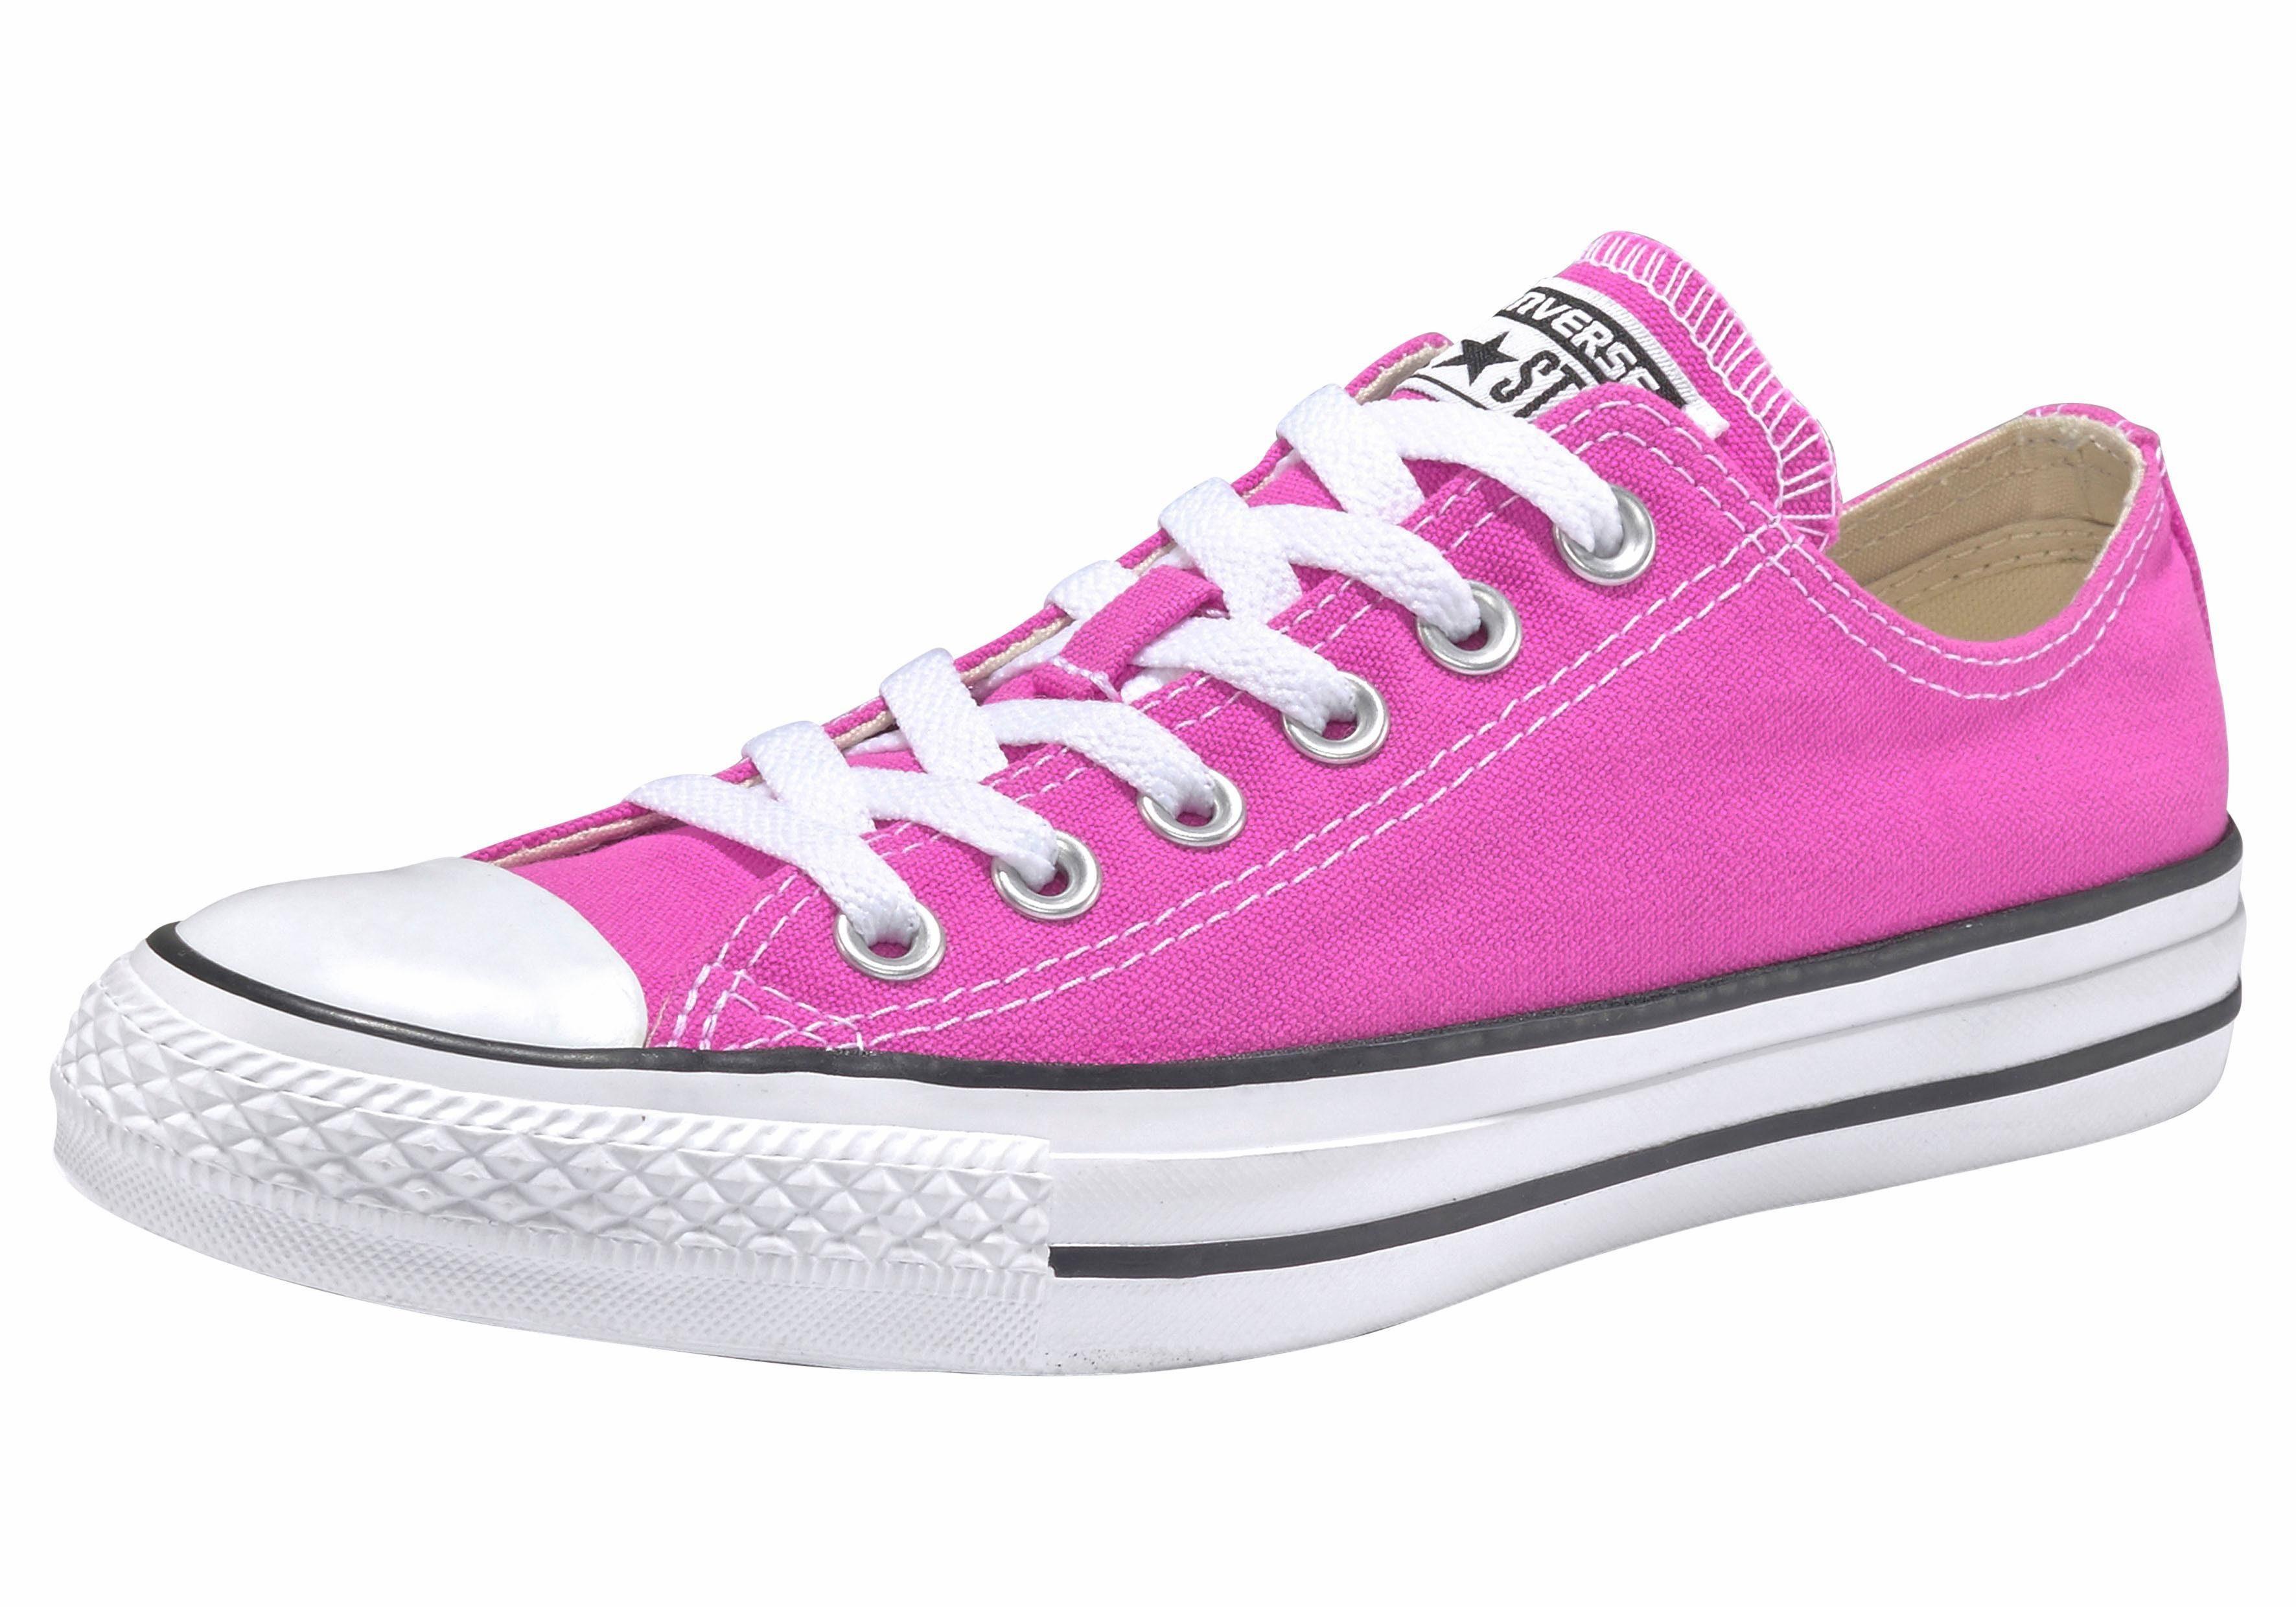 Converse Chuck Taylor All Star Ox Sneaker, Seasonal 1 online kaufen  neonpink